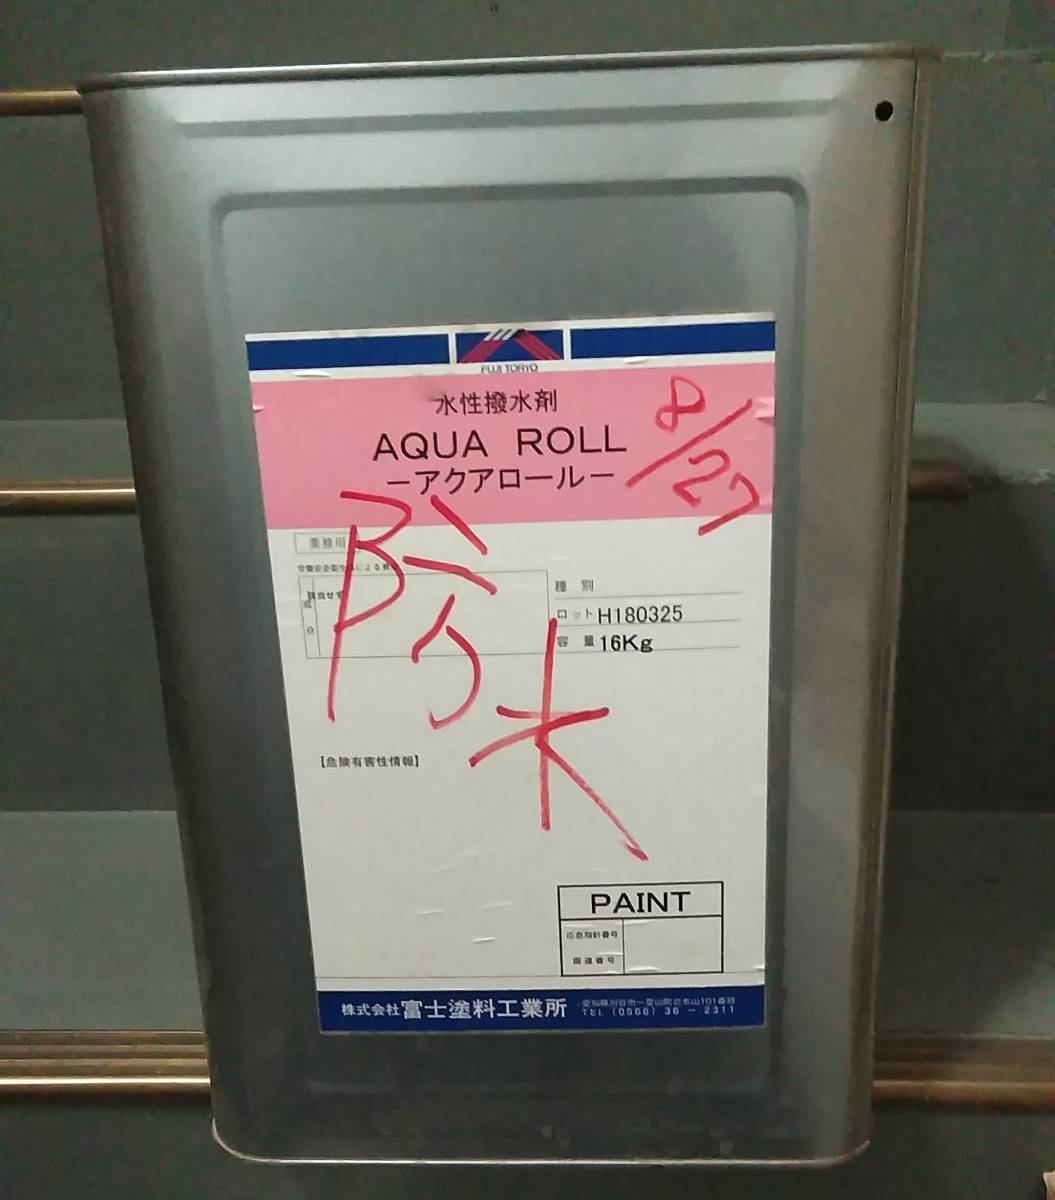 送料込み 廃番品「水性撥水剤 アクアロール 16㎏」未開封 富士塗料工業所_画像1